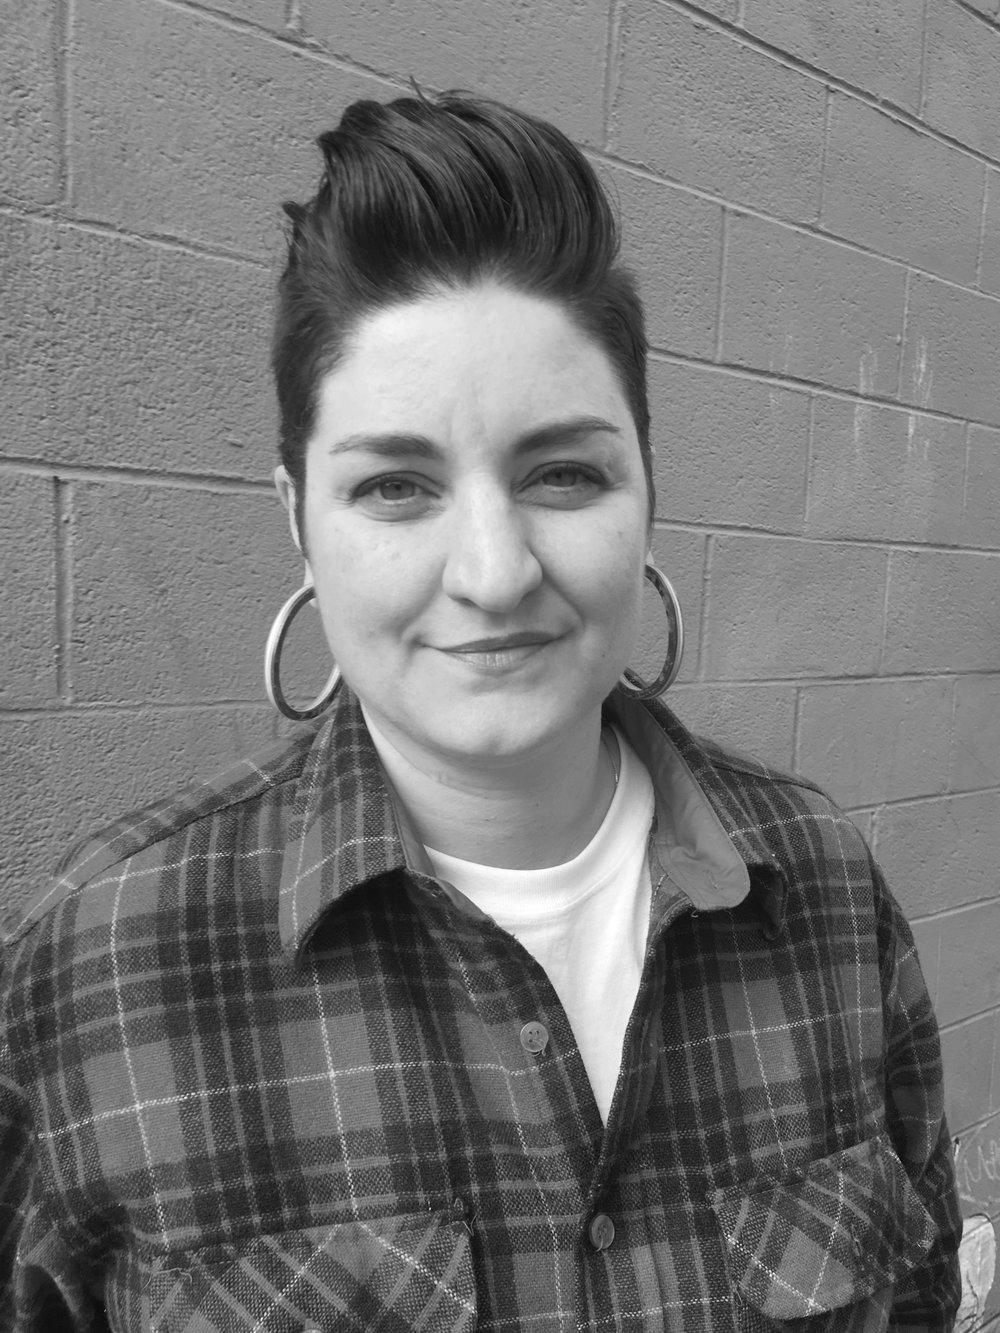 Gina Senarighi LGBTQ Couples Counselor